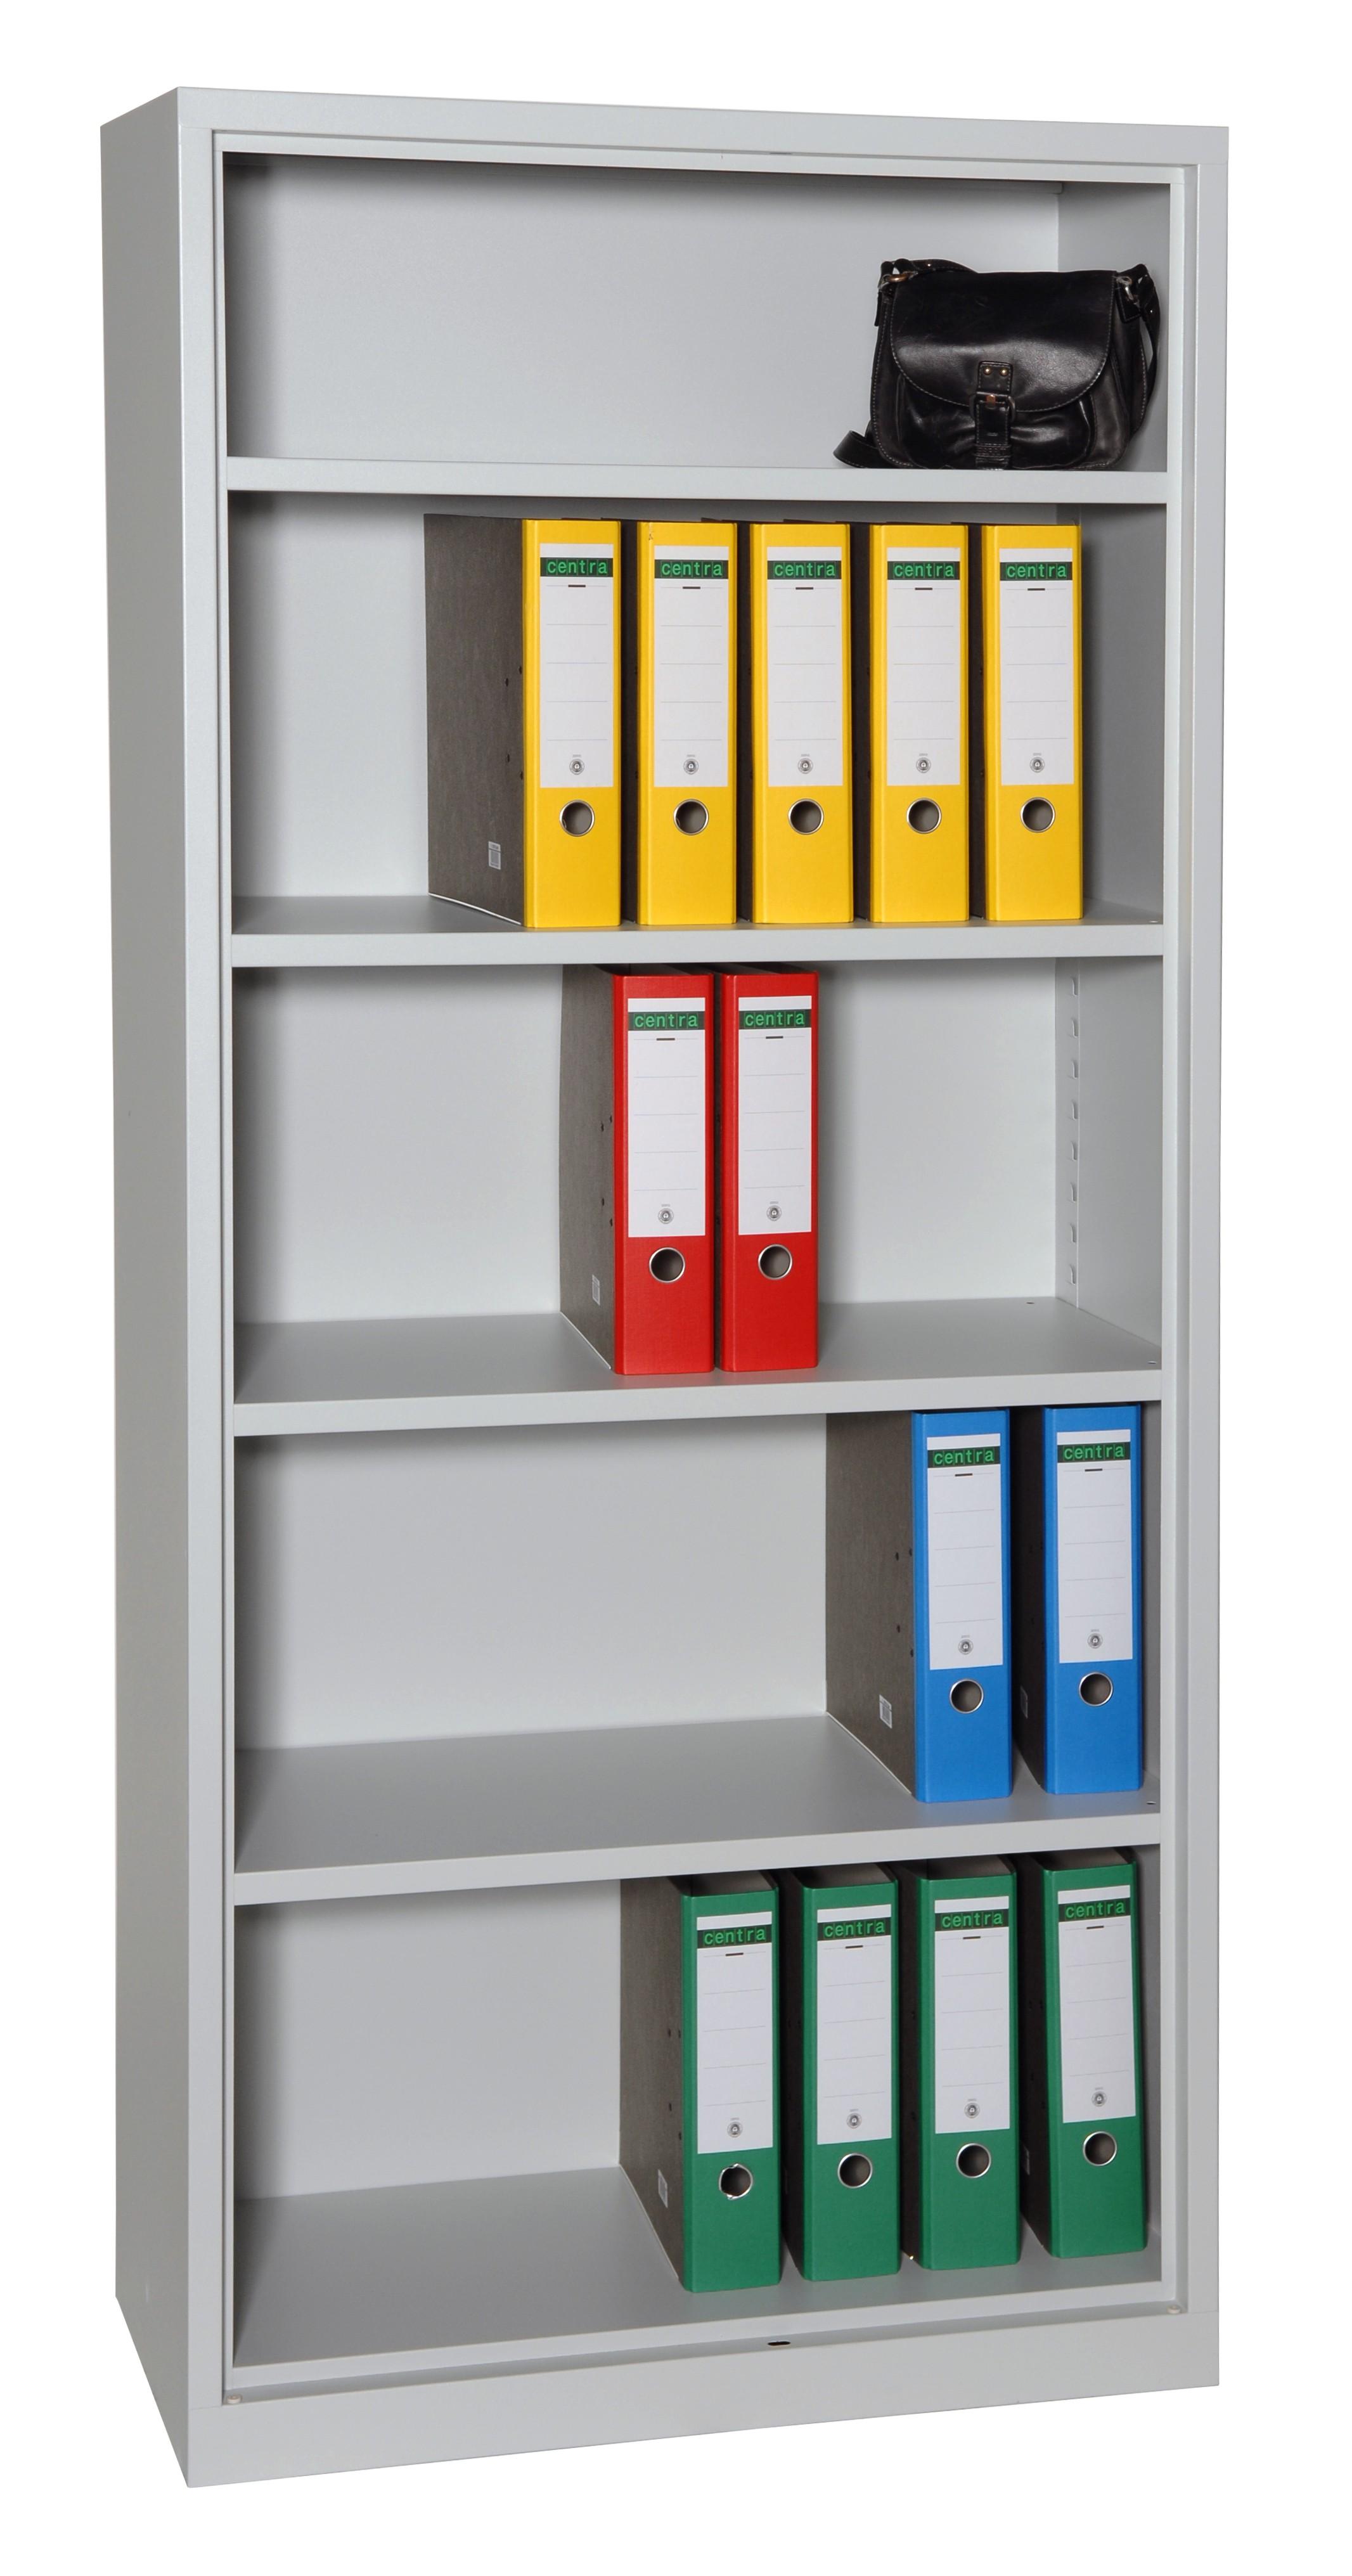 Büro Regalschrank Metall 180 cm hoch | Fintabo® Seite 16